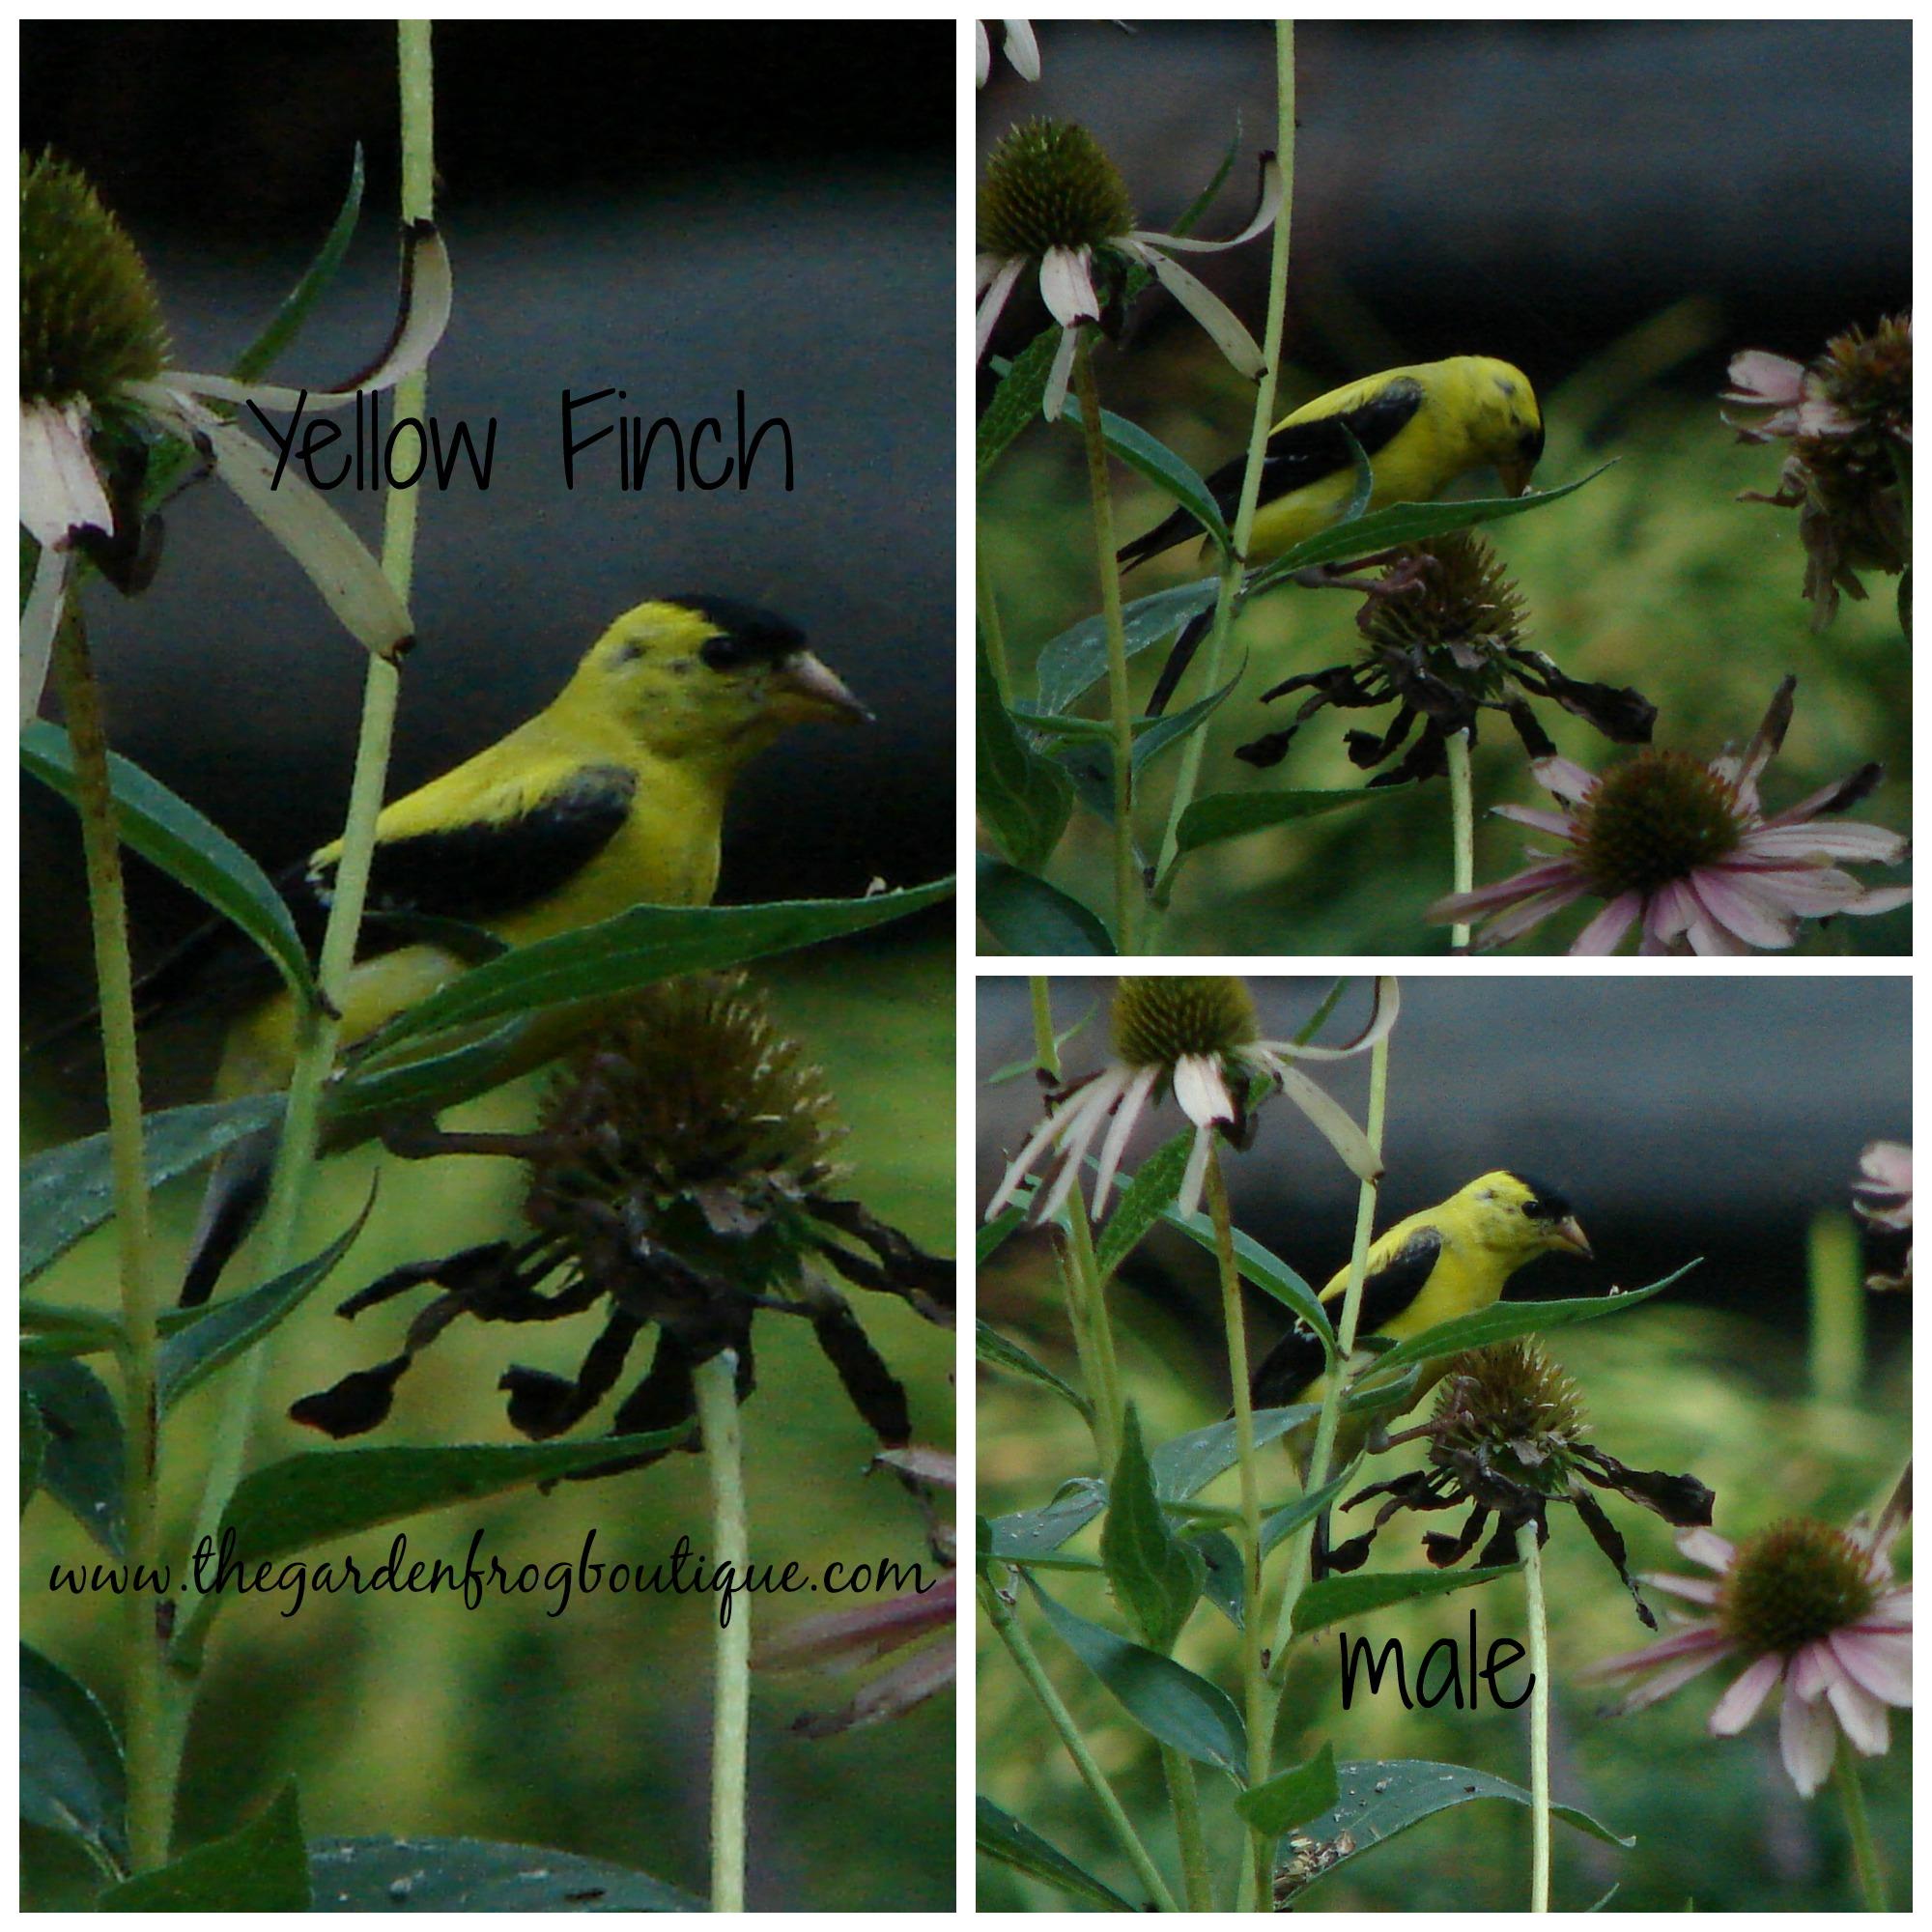 Yellow Finch male